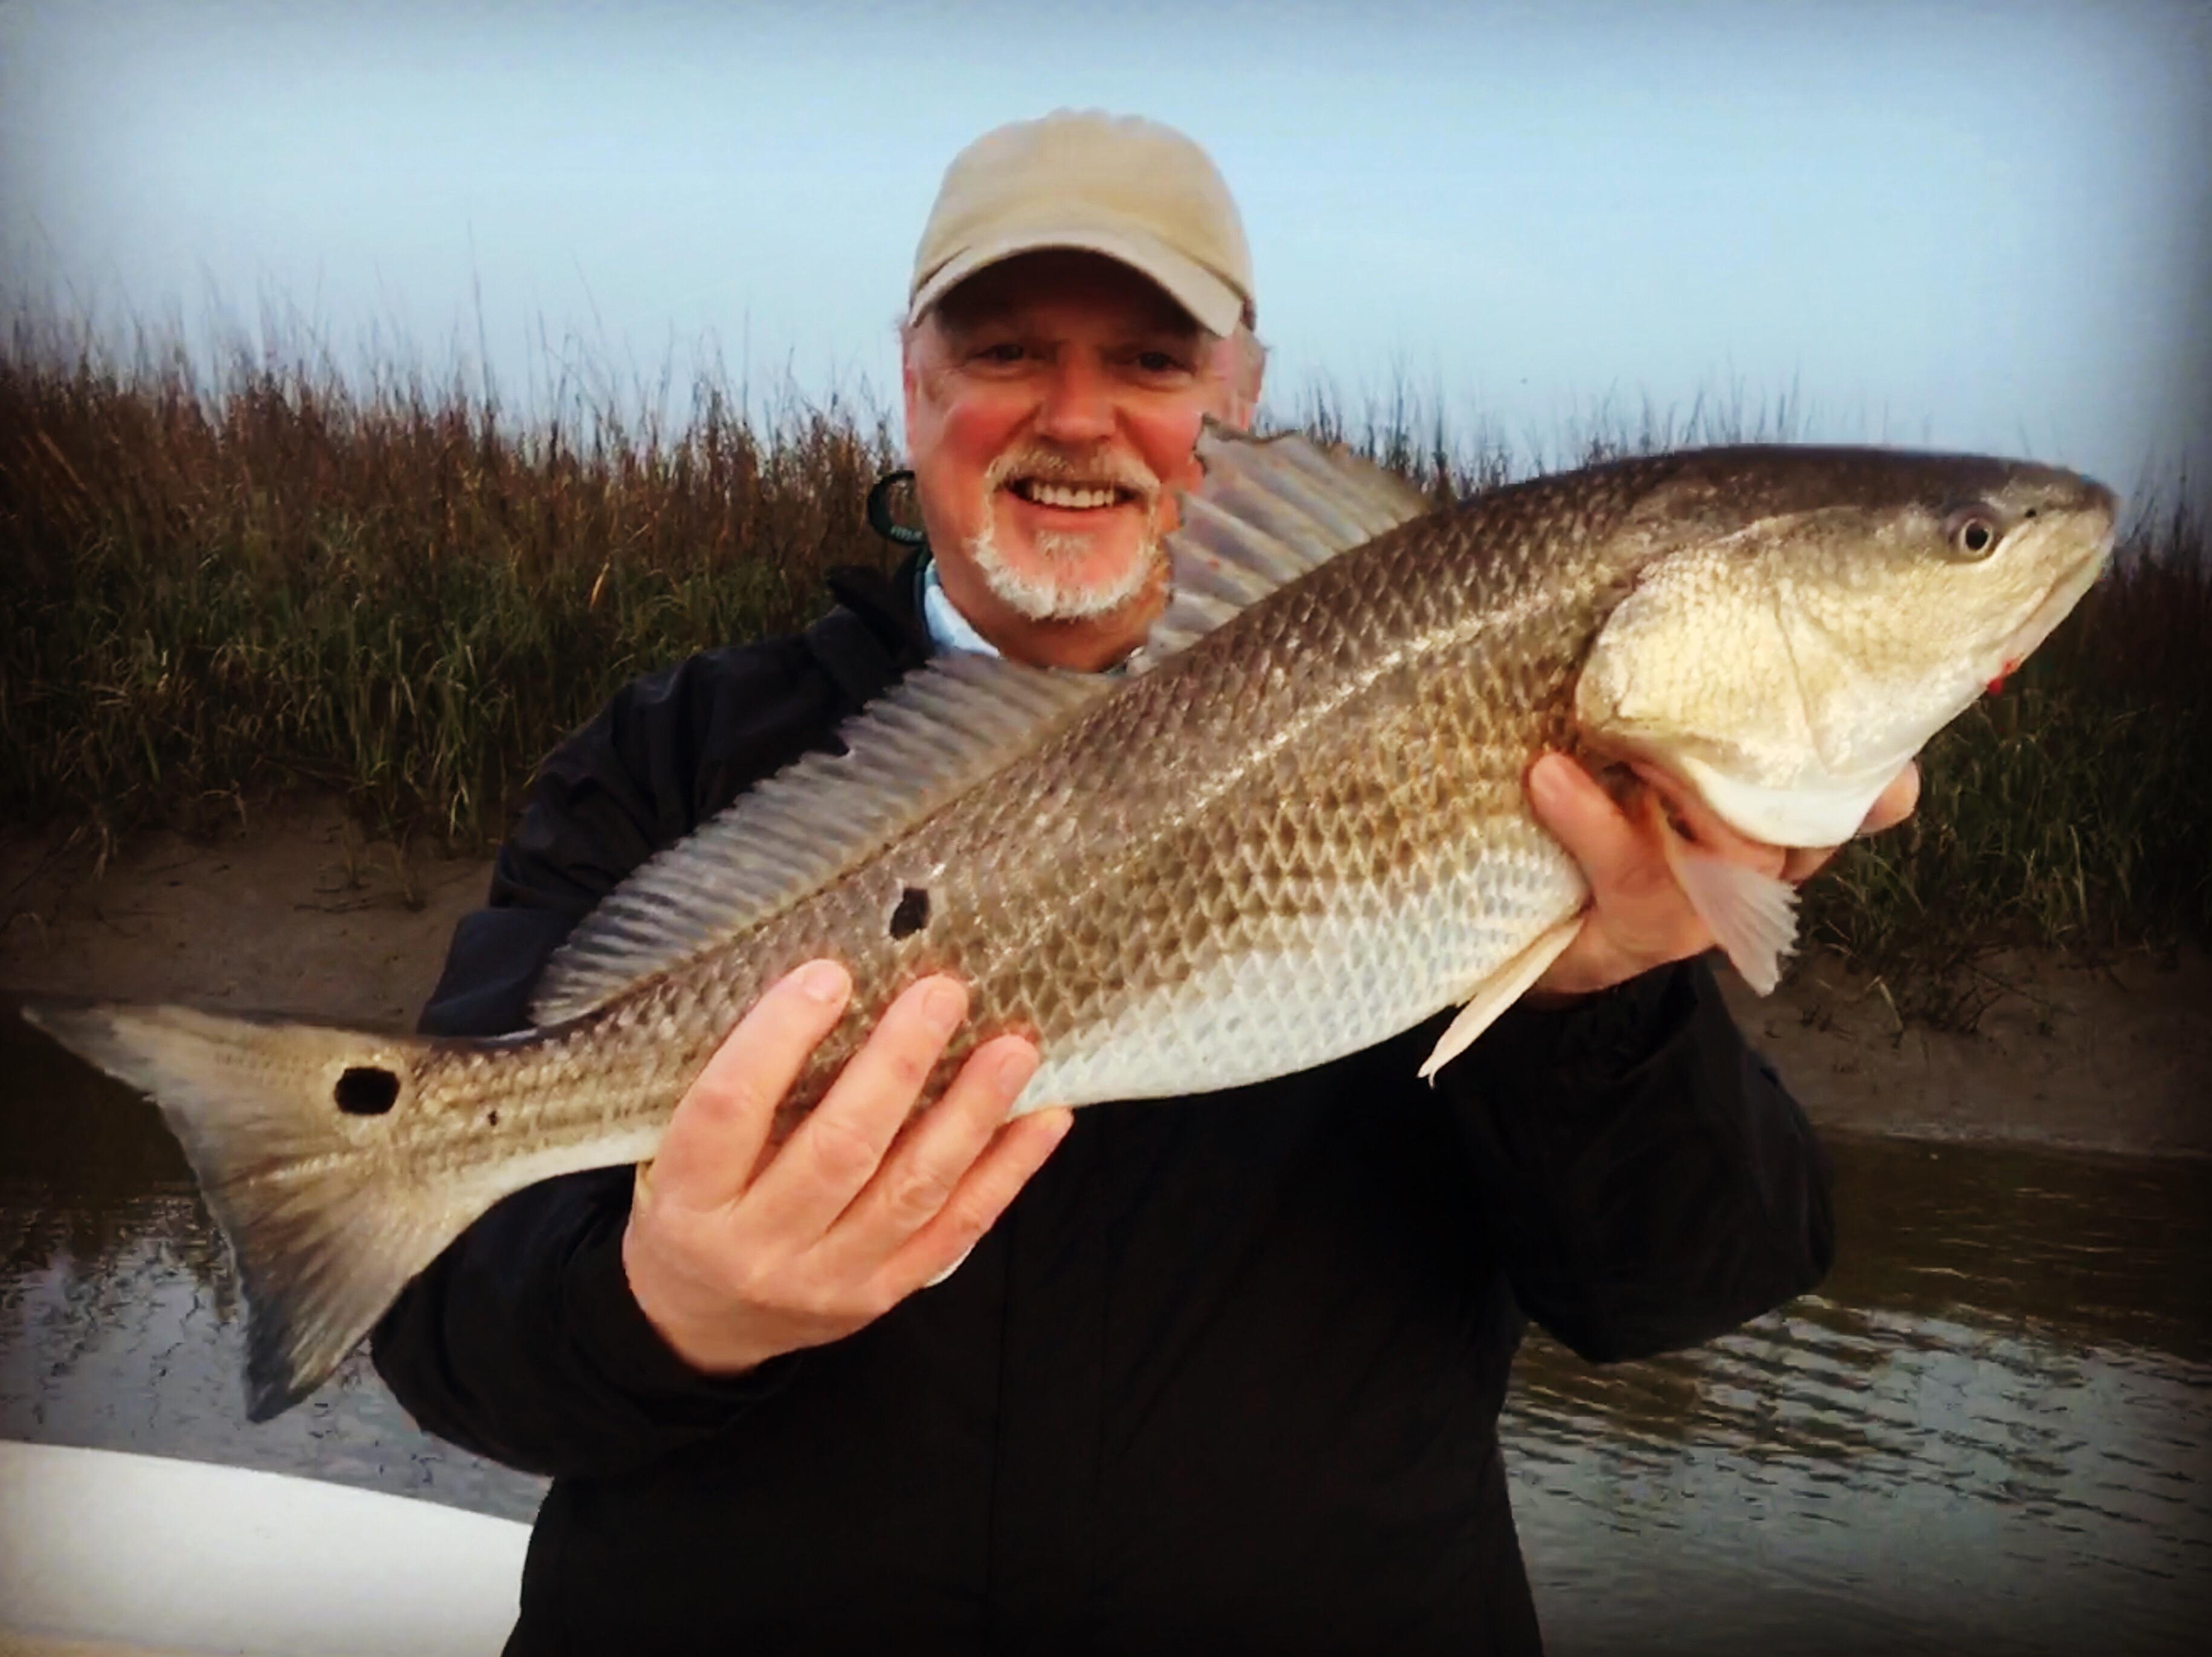 St Simons Island Fishing Report 2/15/2019